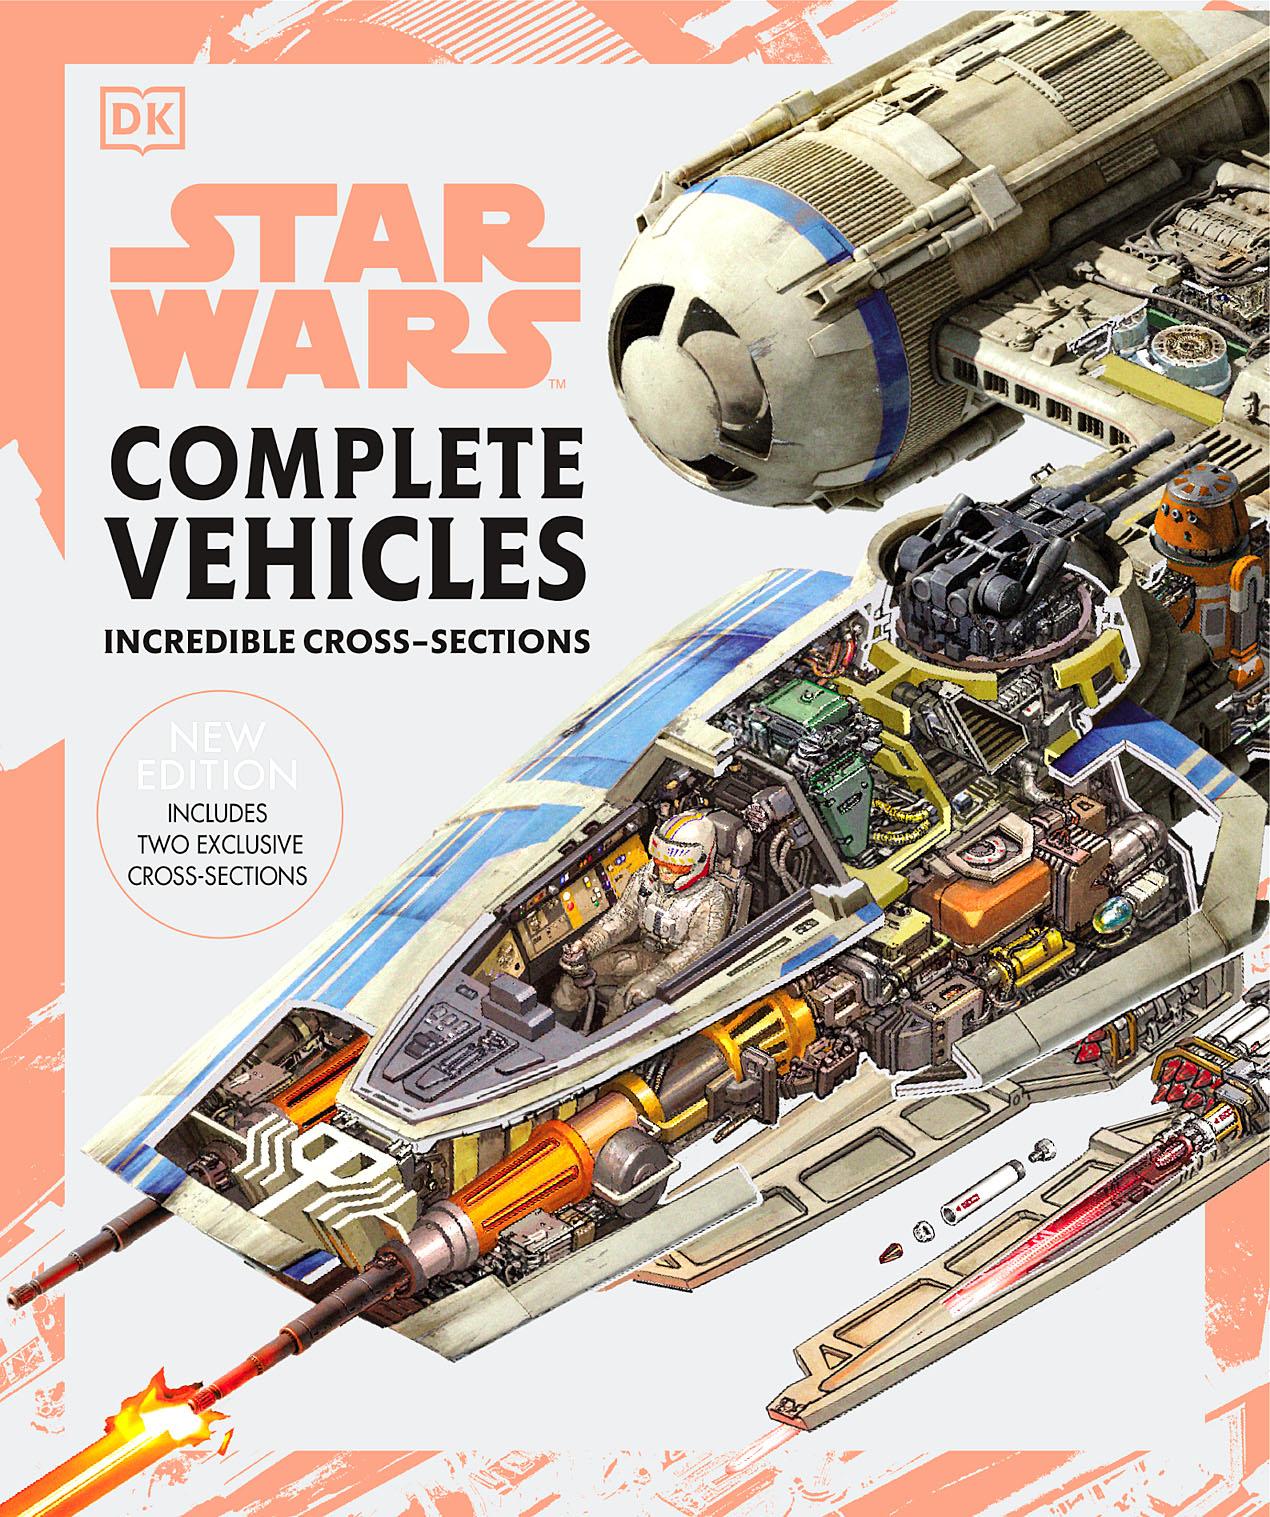 Star Wars - Complete Vehicles Pablo Hidalgo.jpg